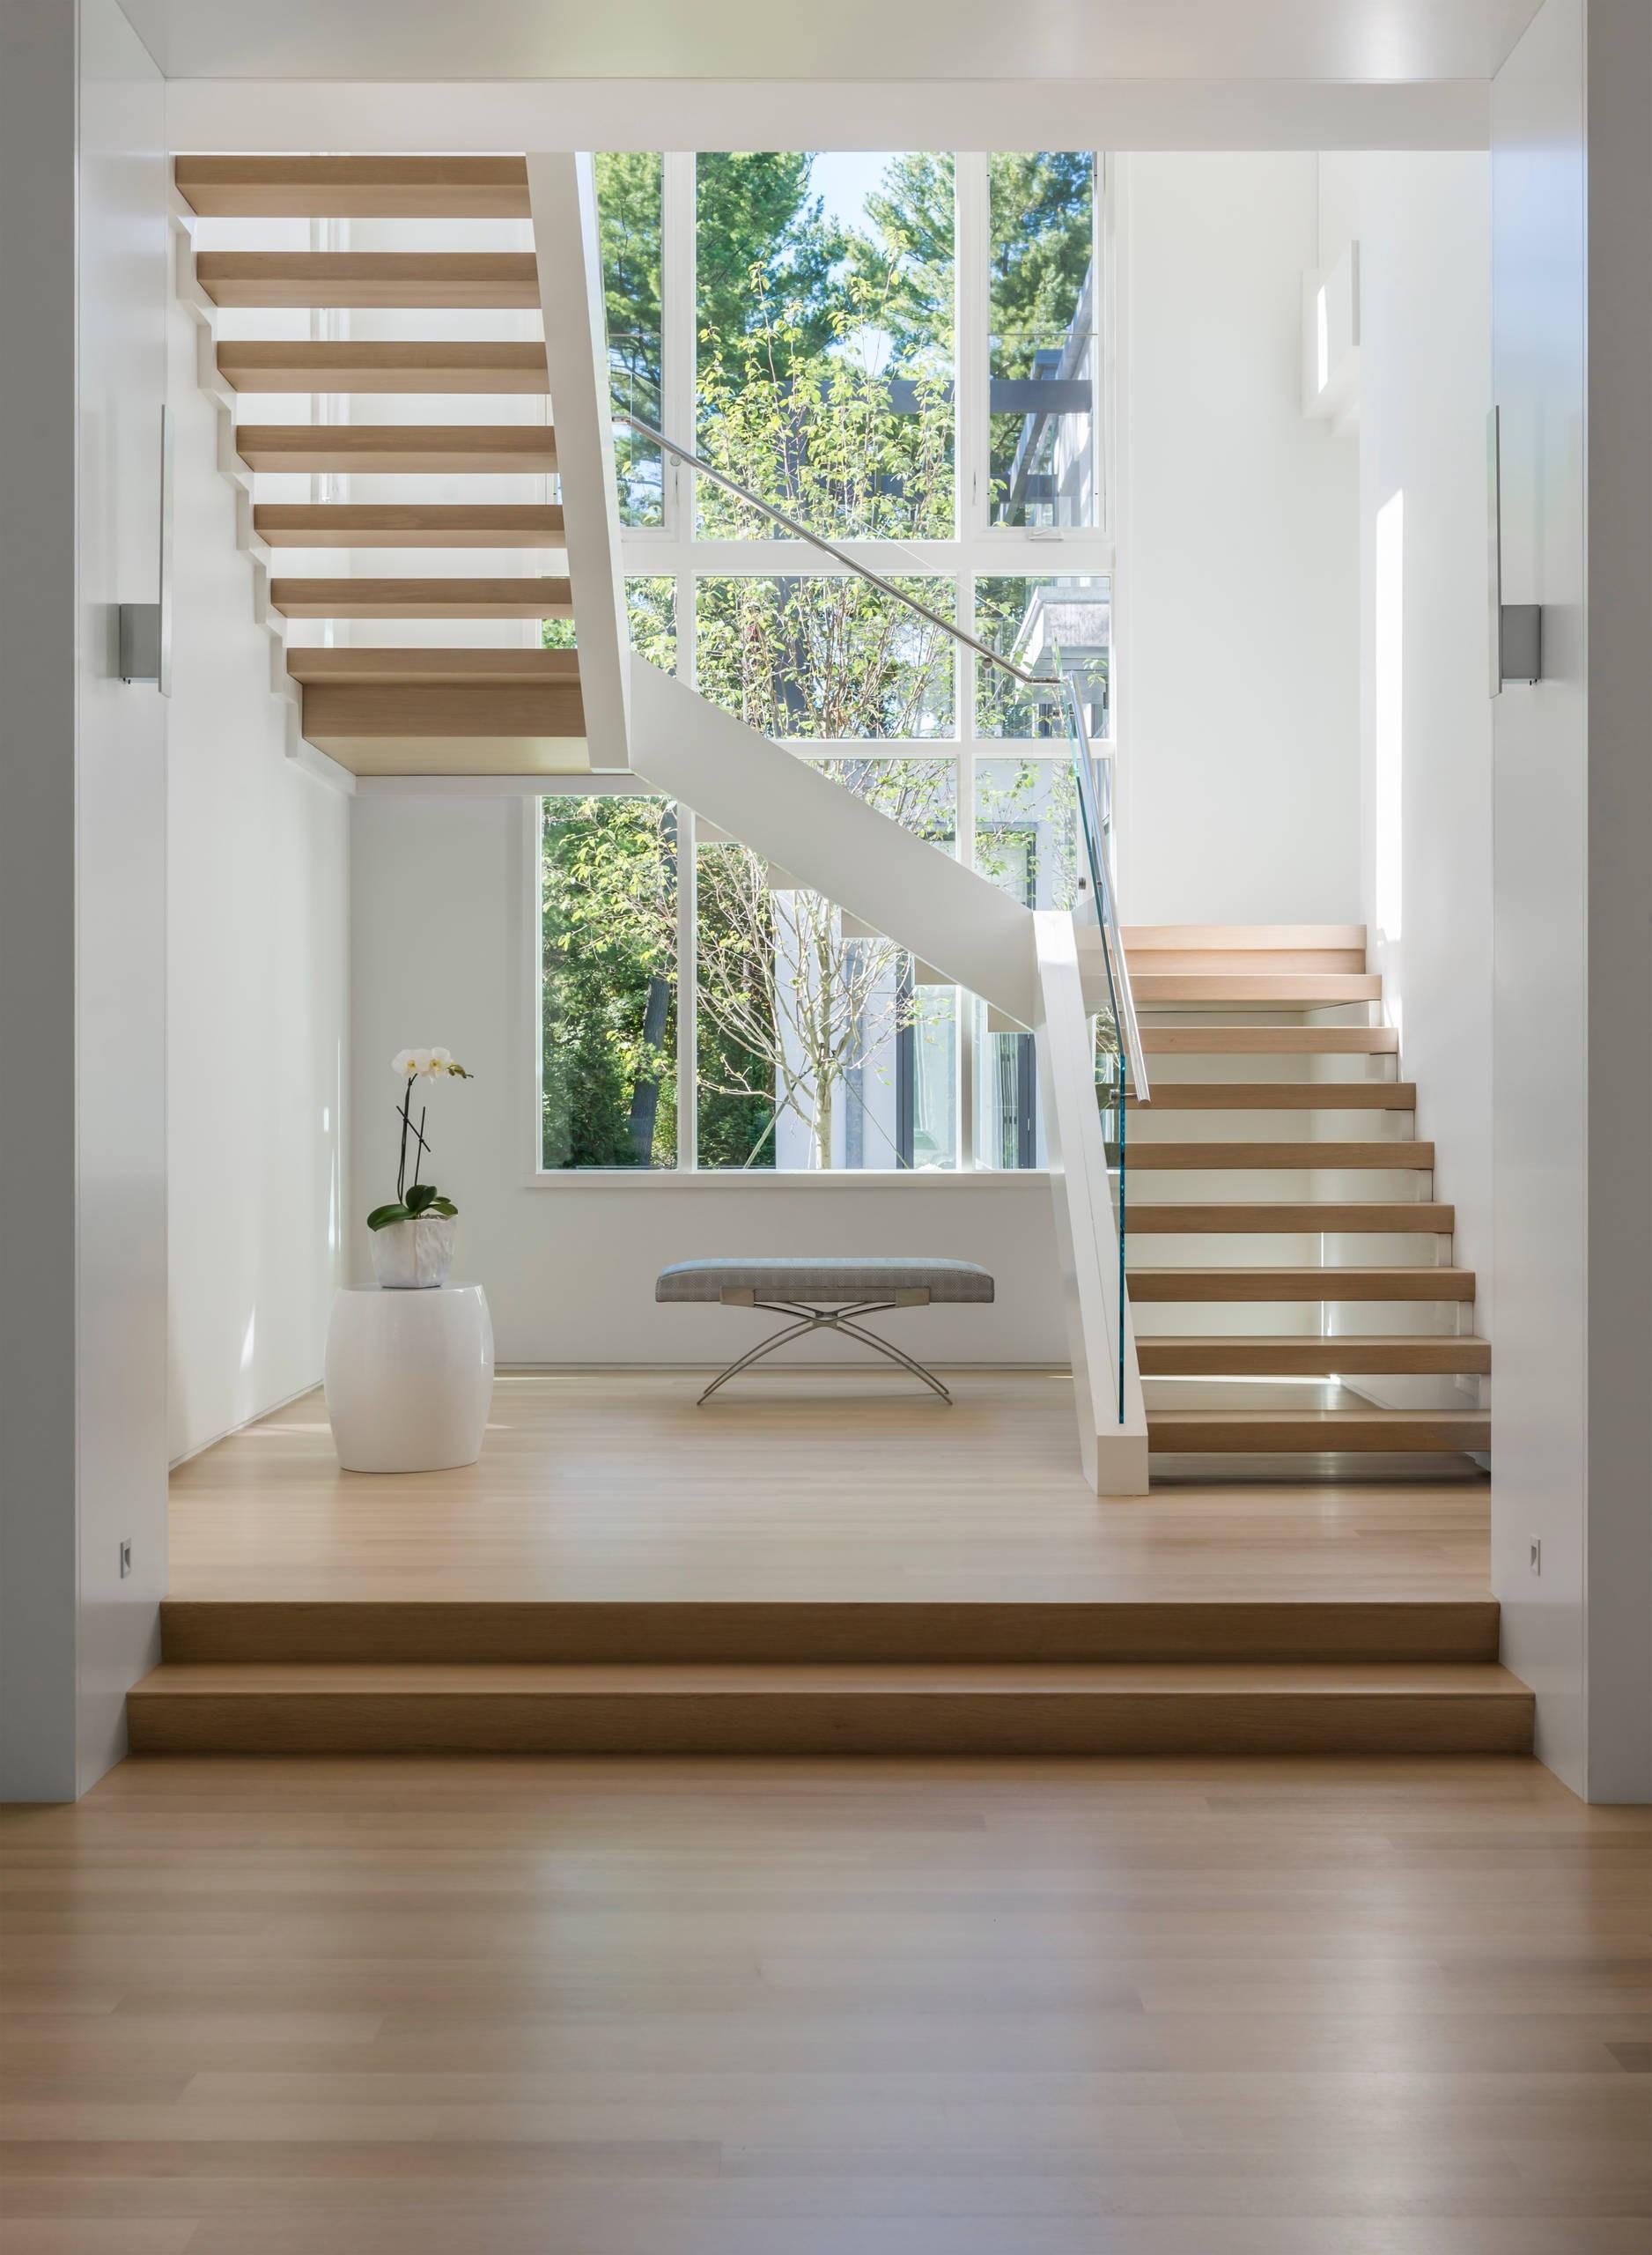 75 Beautiful Staircase Pictures Ideas September 2020 Houzz | Steps Design Inside Home | Beautiful | Wooden | Ultra Modern | Sala | Behind Duplex